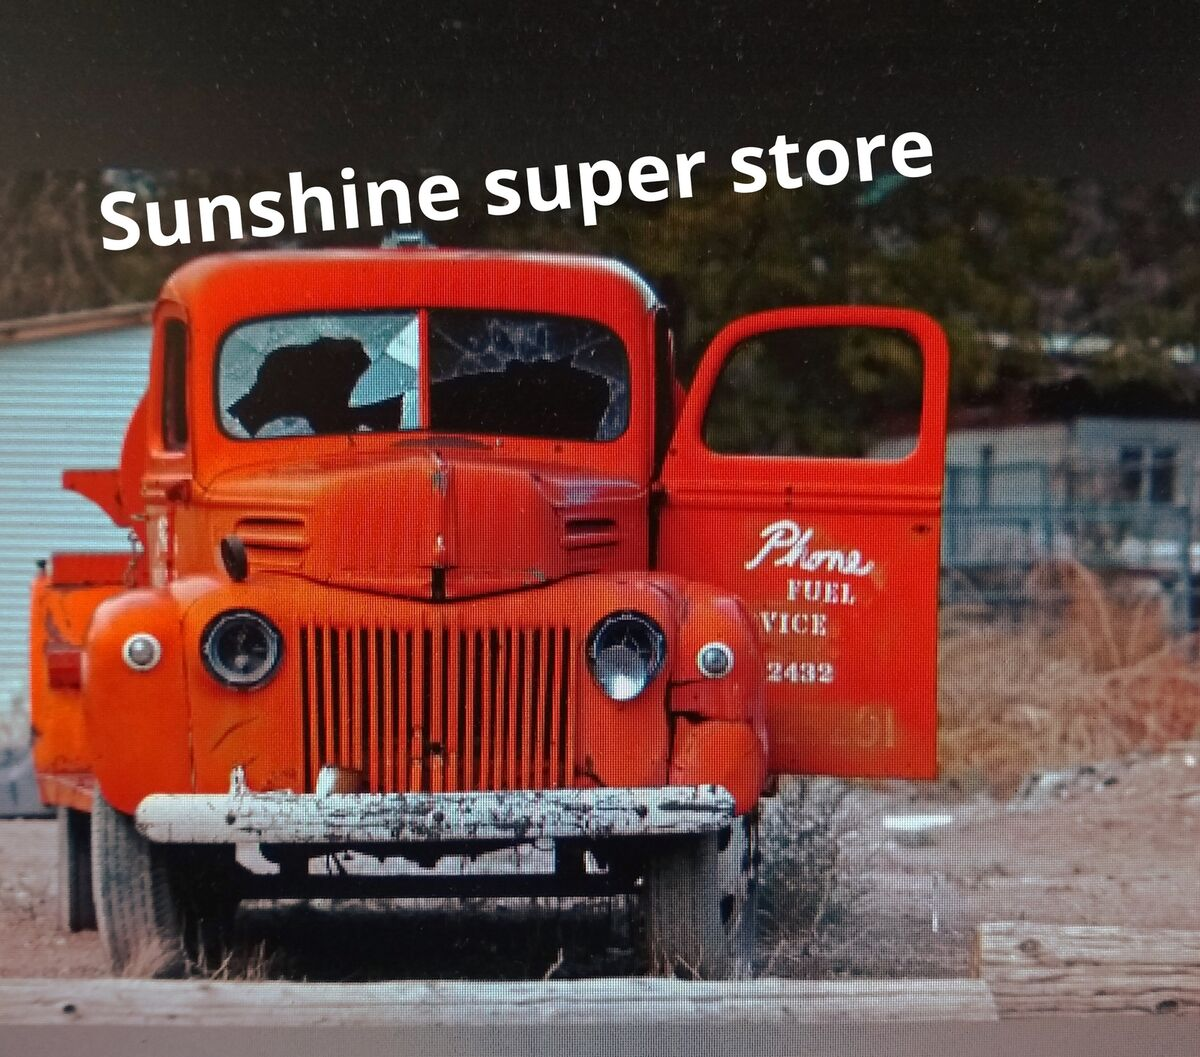 Sunshine super Store